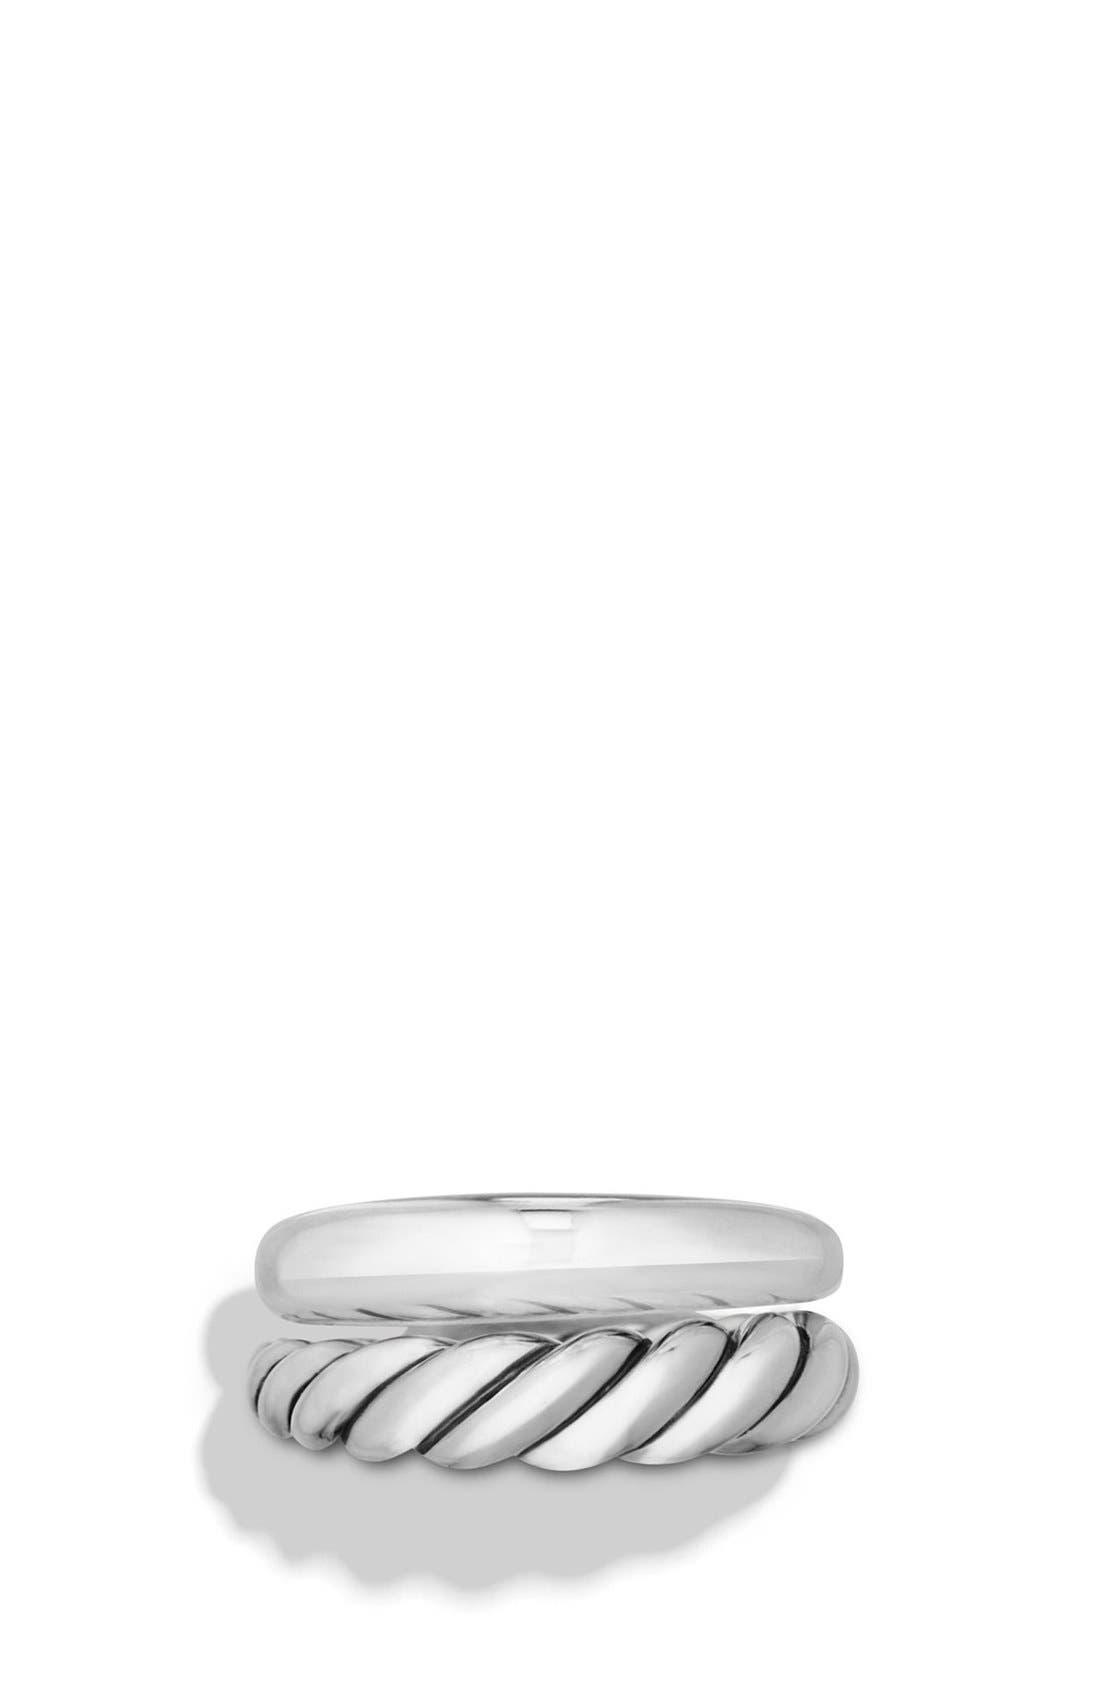 Alternate Image 2  - David Yurman 'Pure Form' Sterling Silver Stacking Rings (Set of 2)